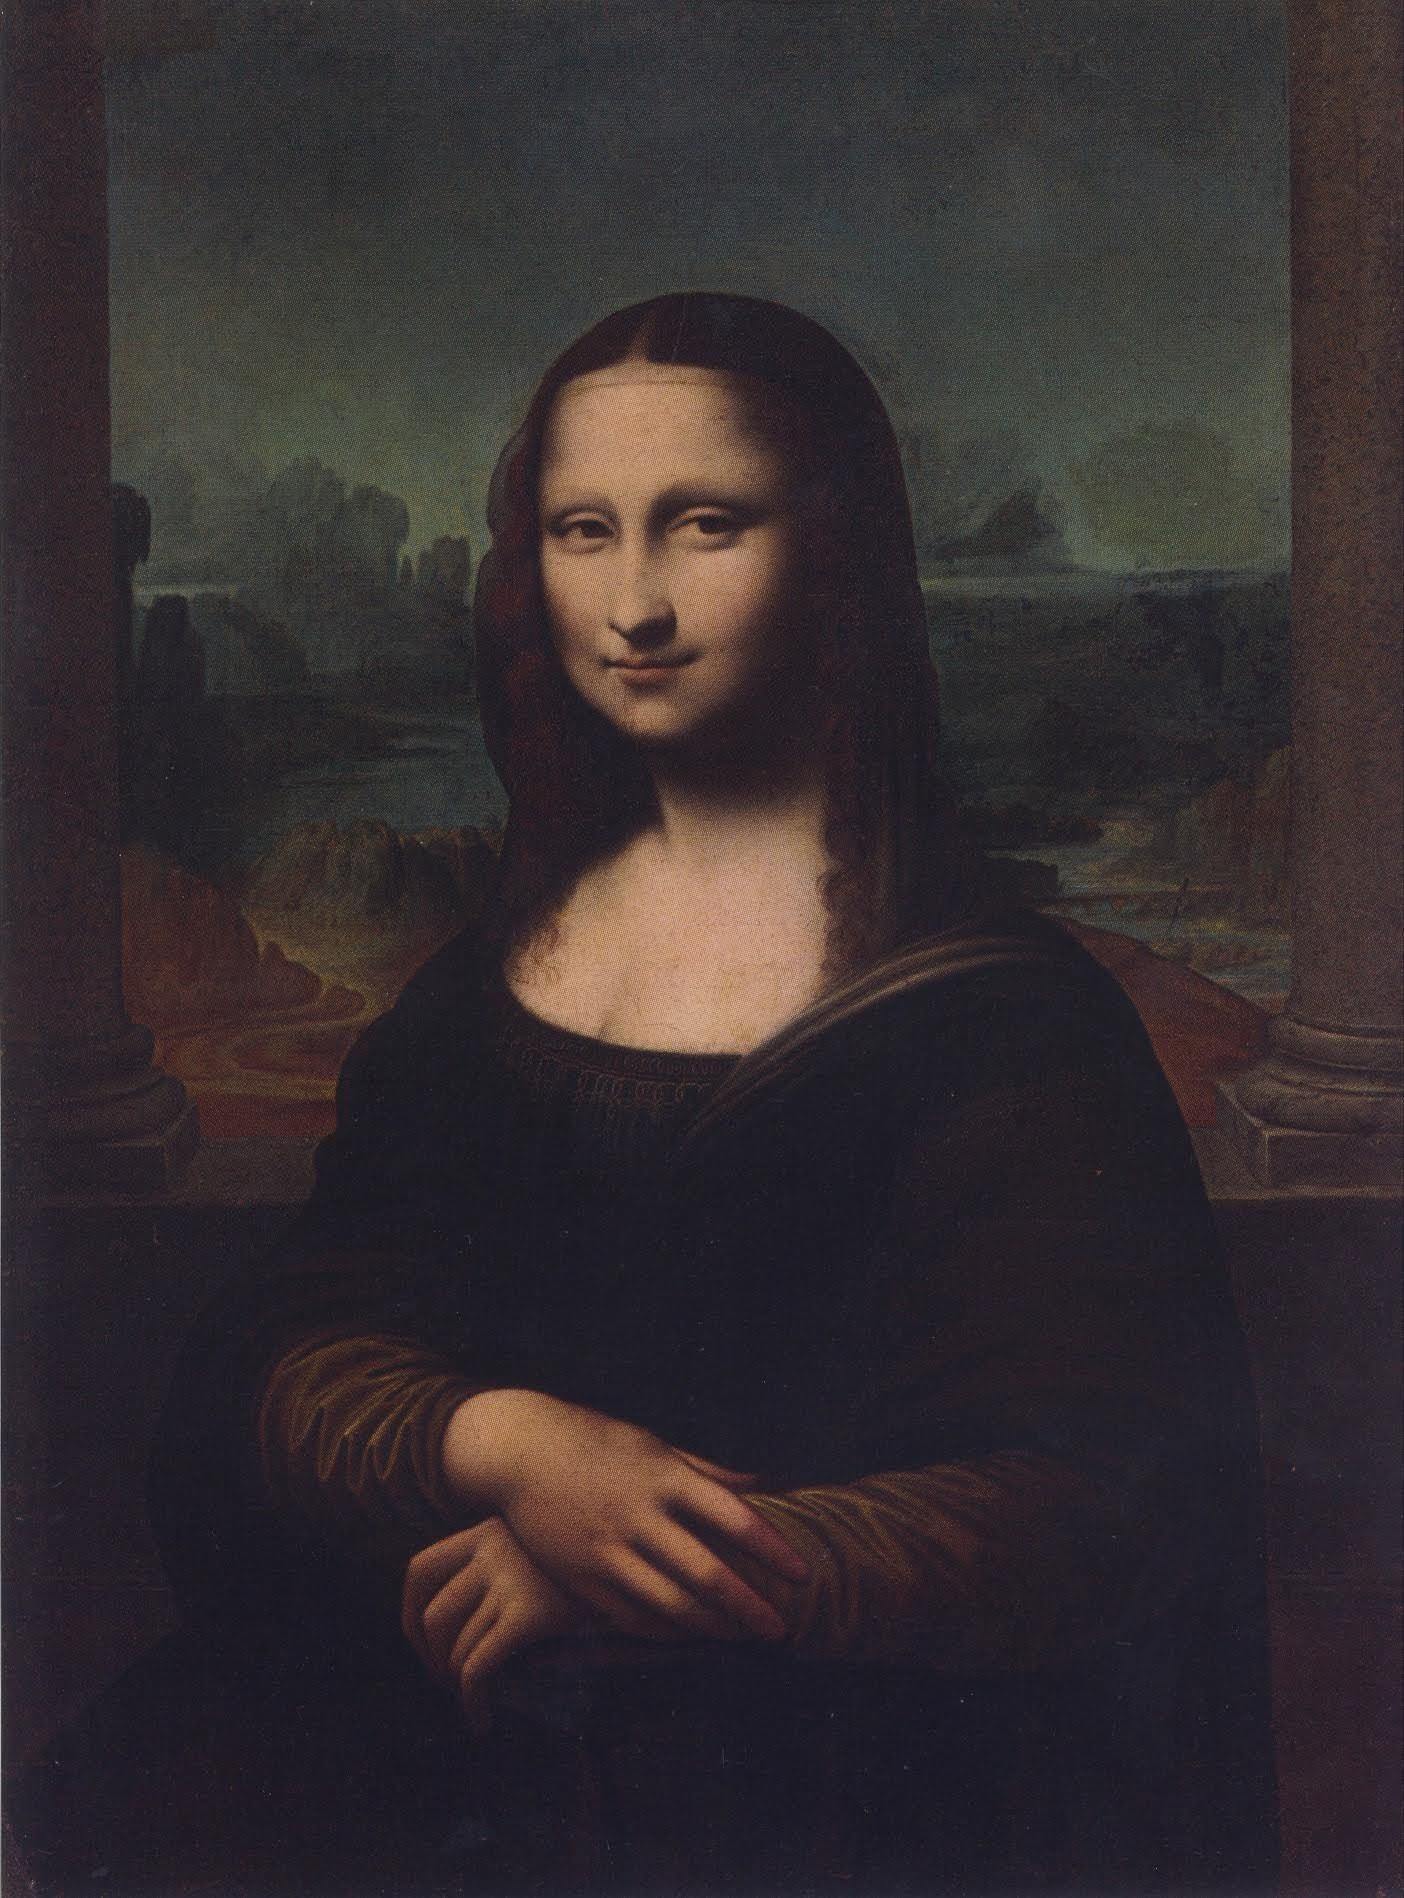 Un investigador italiano aseguró que encontró otra Mona Lisa de Da Vinci